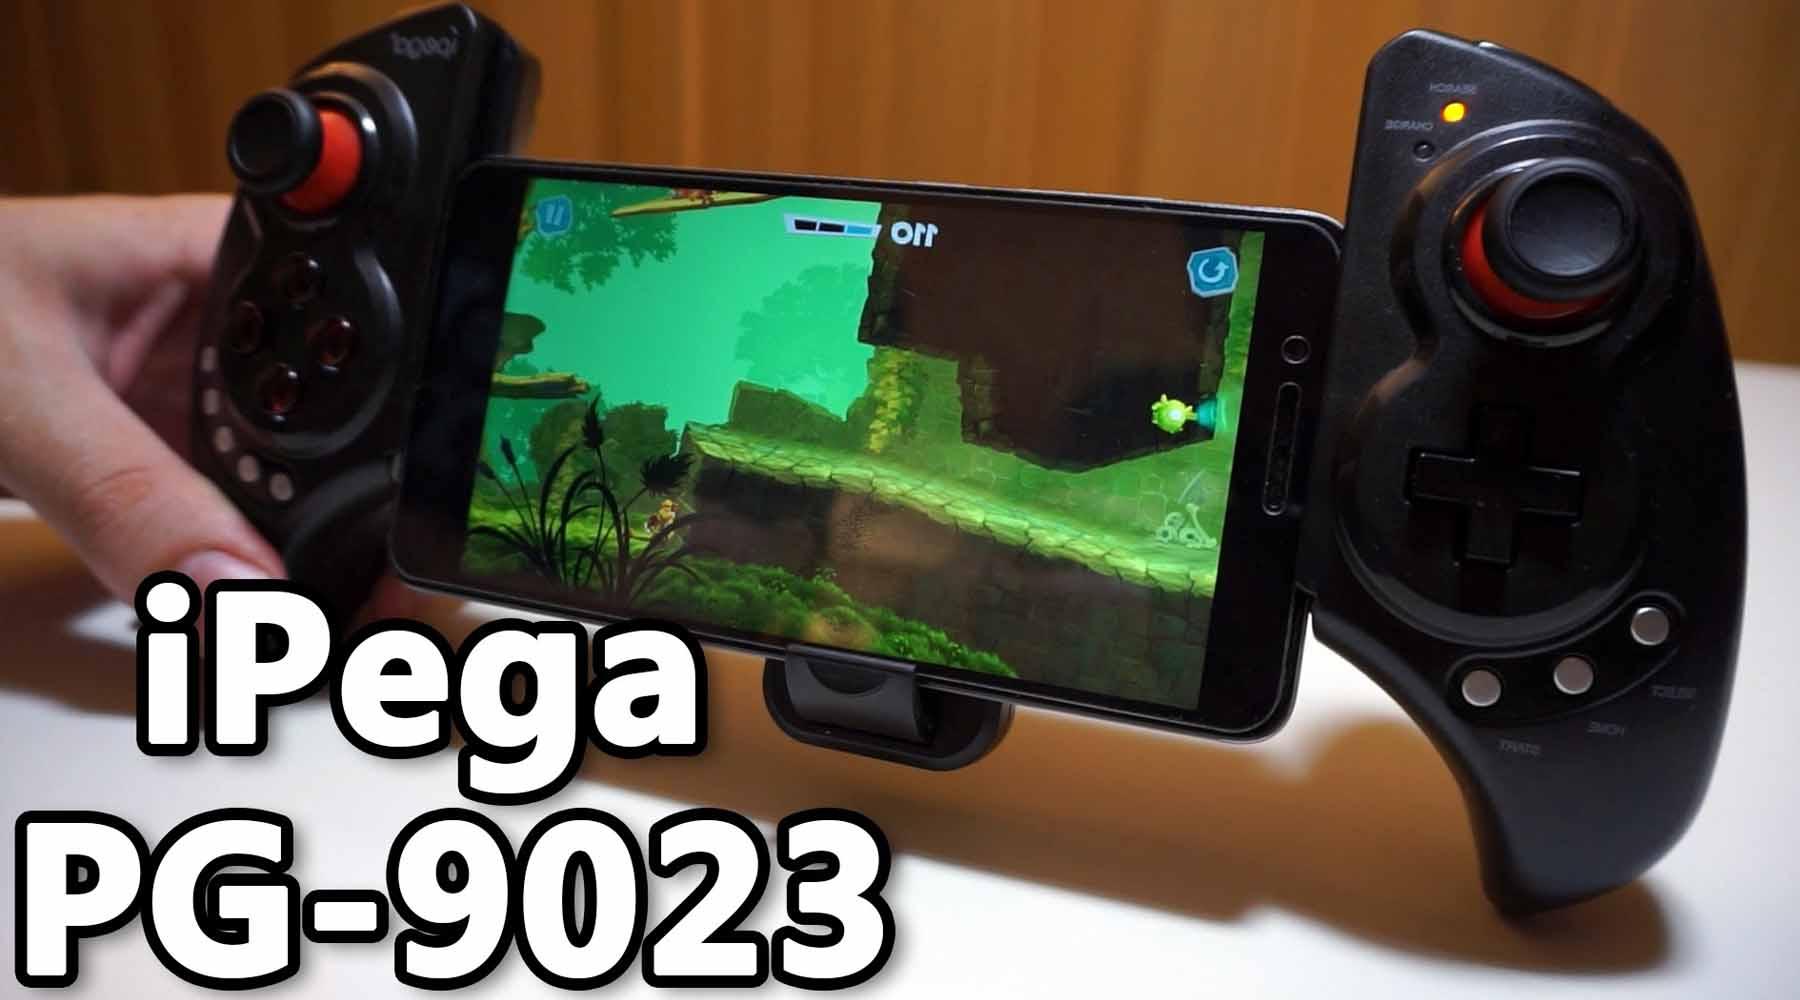 iPEGA 9023 Bluetooth